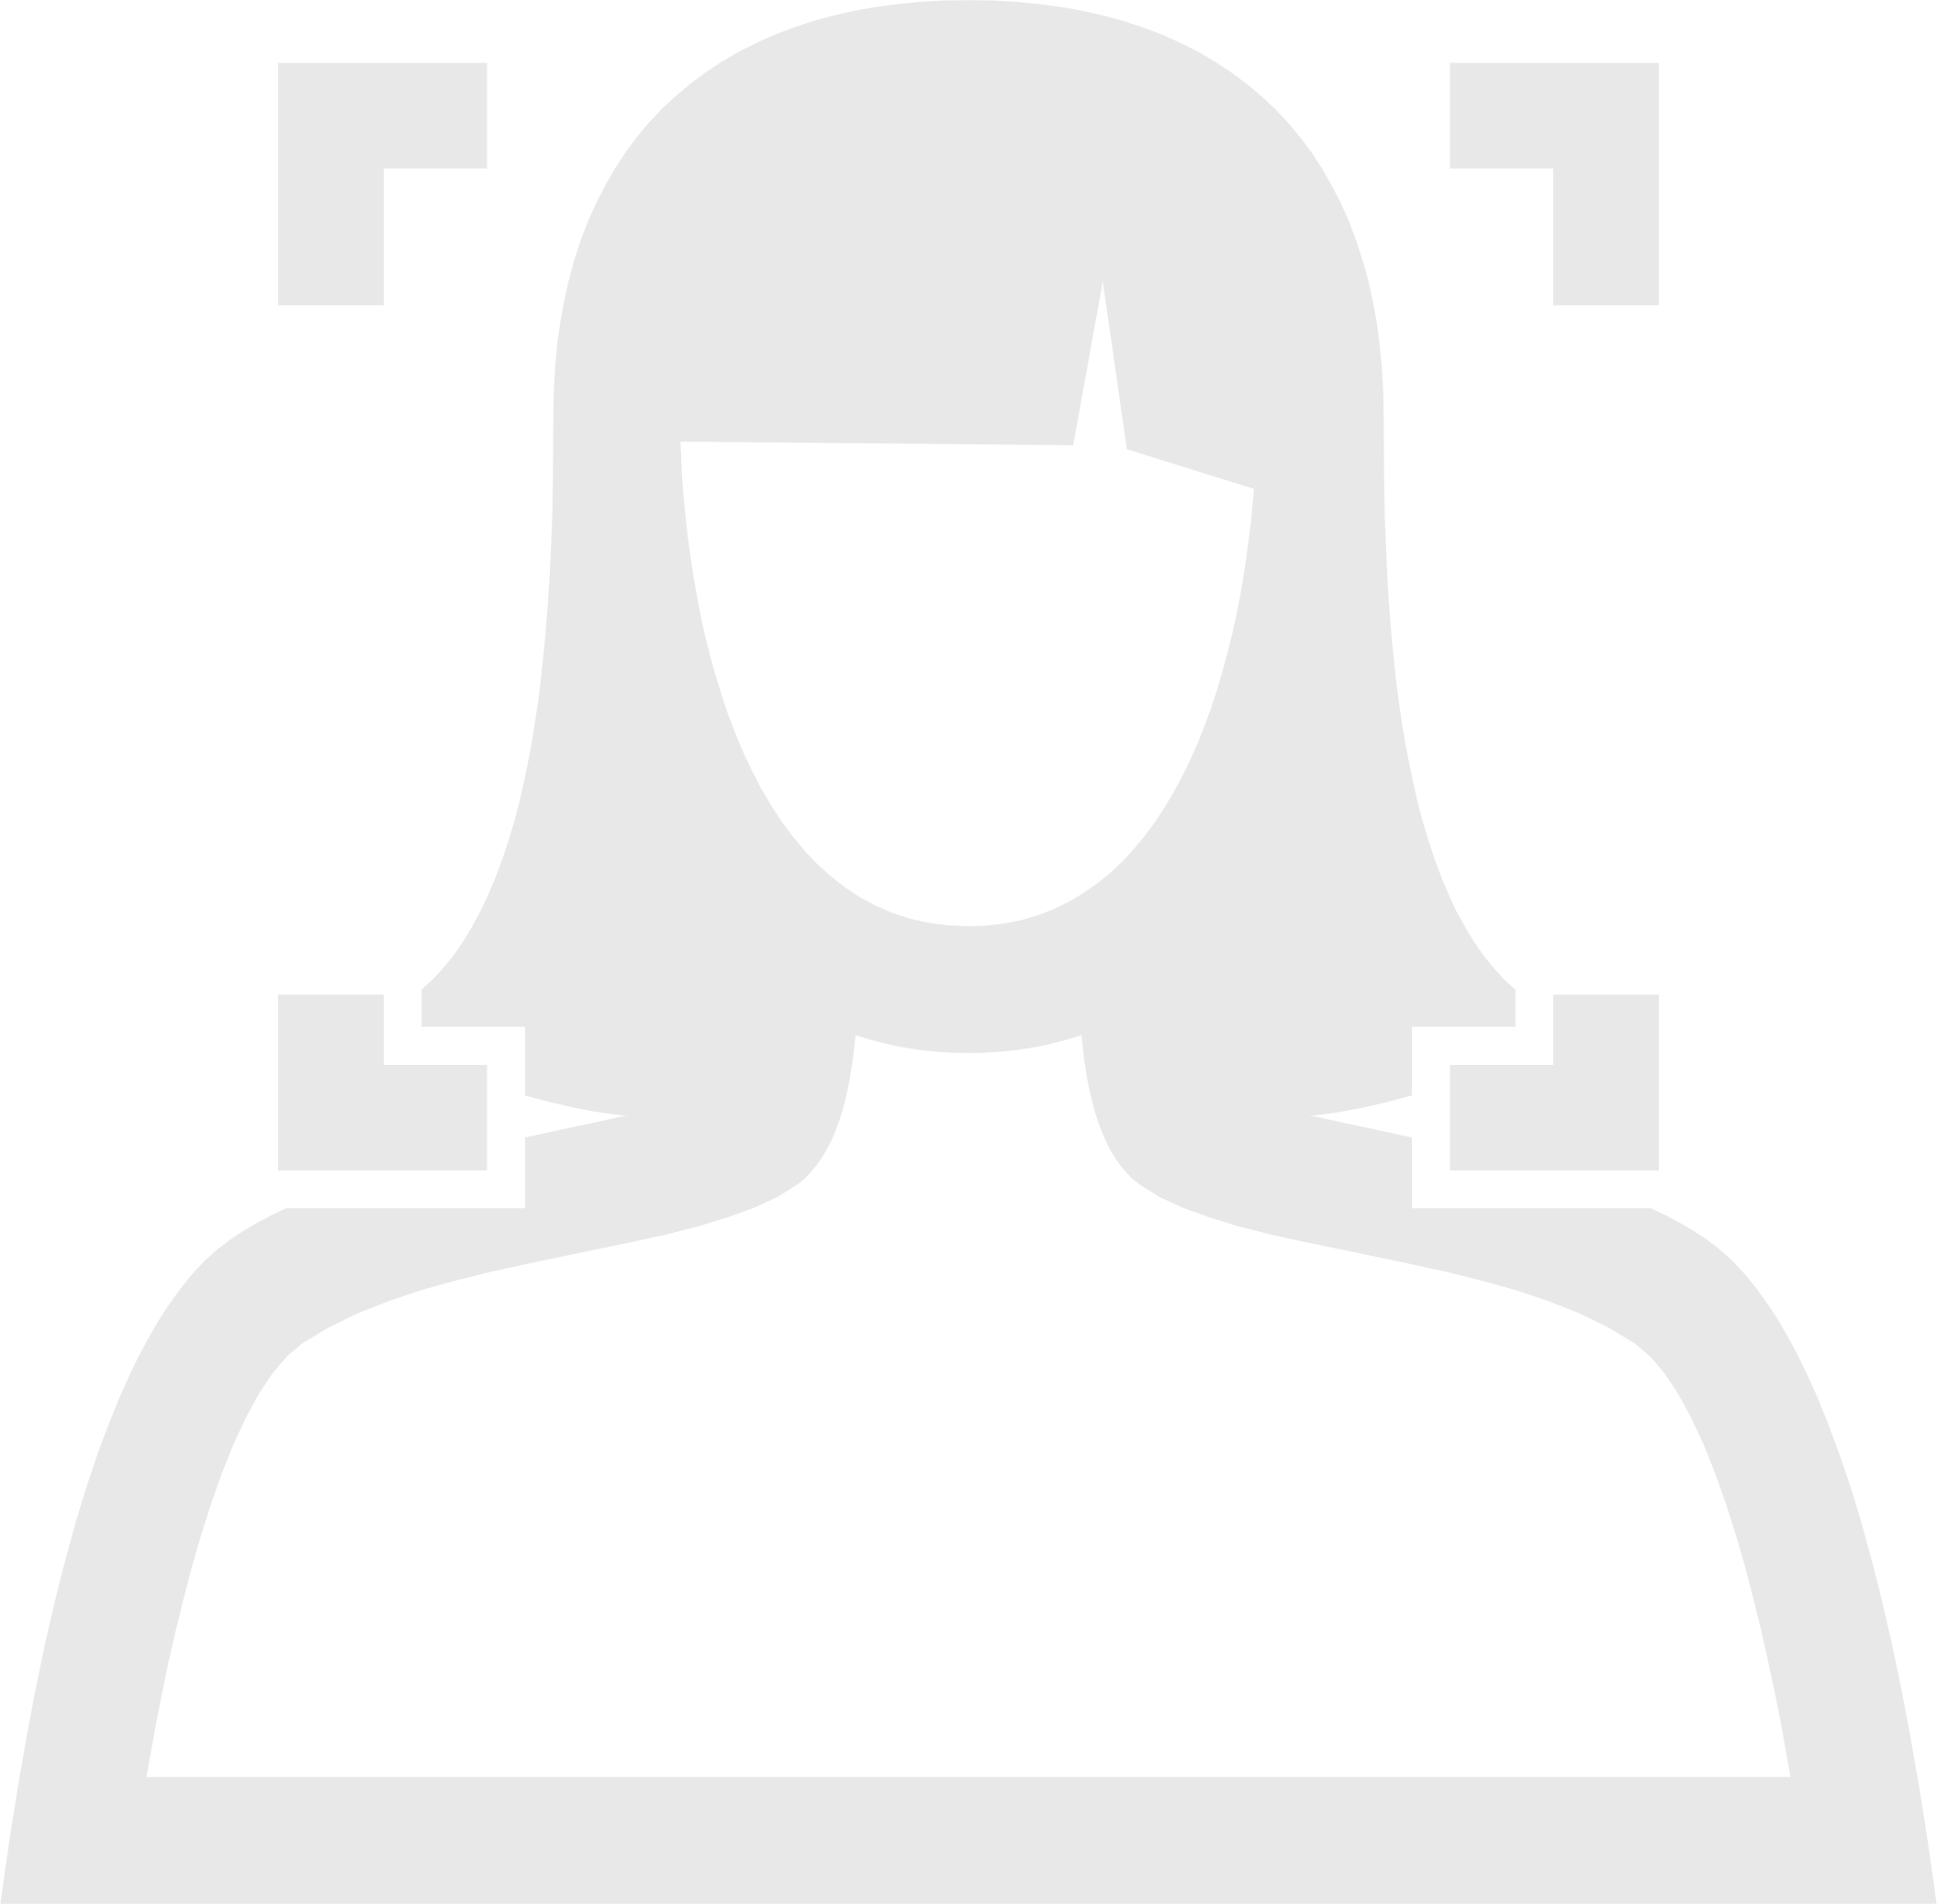 noun_identification_2791422